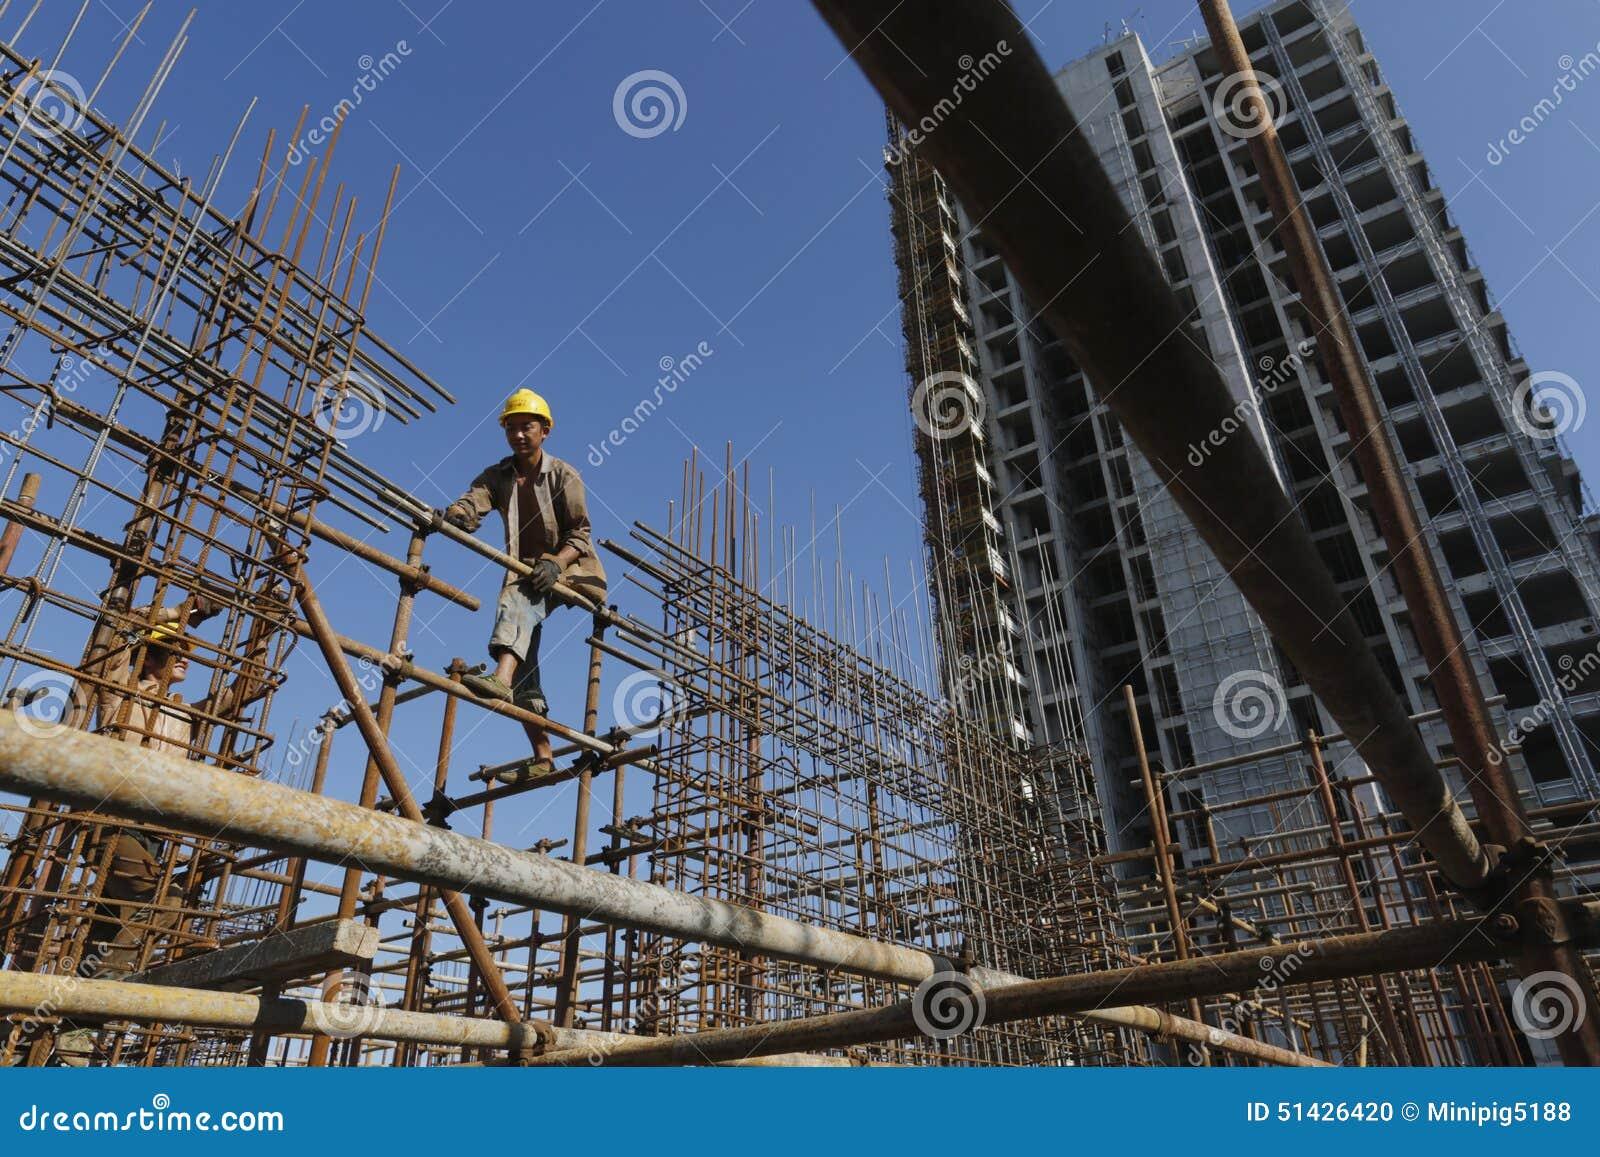 Bar Ties Construction : Construction worker ties reinforcing steel stock photo